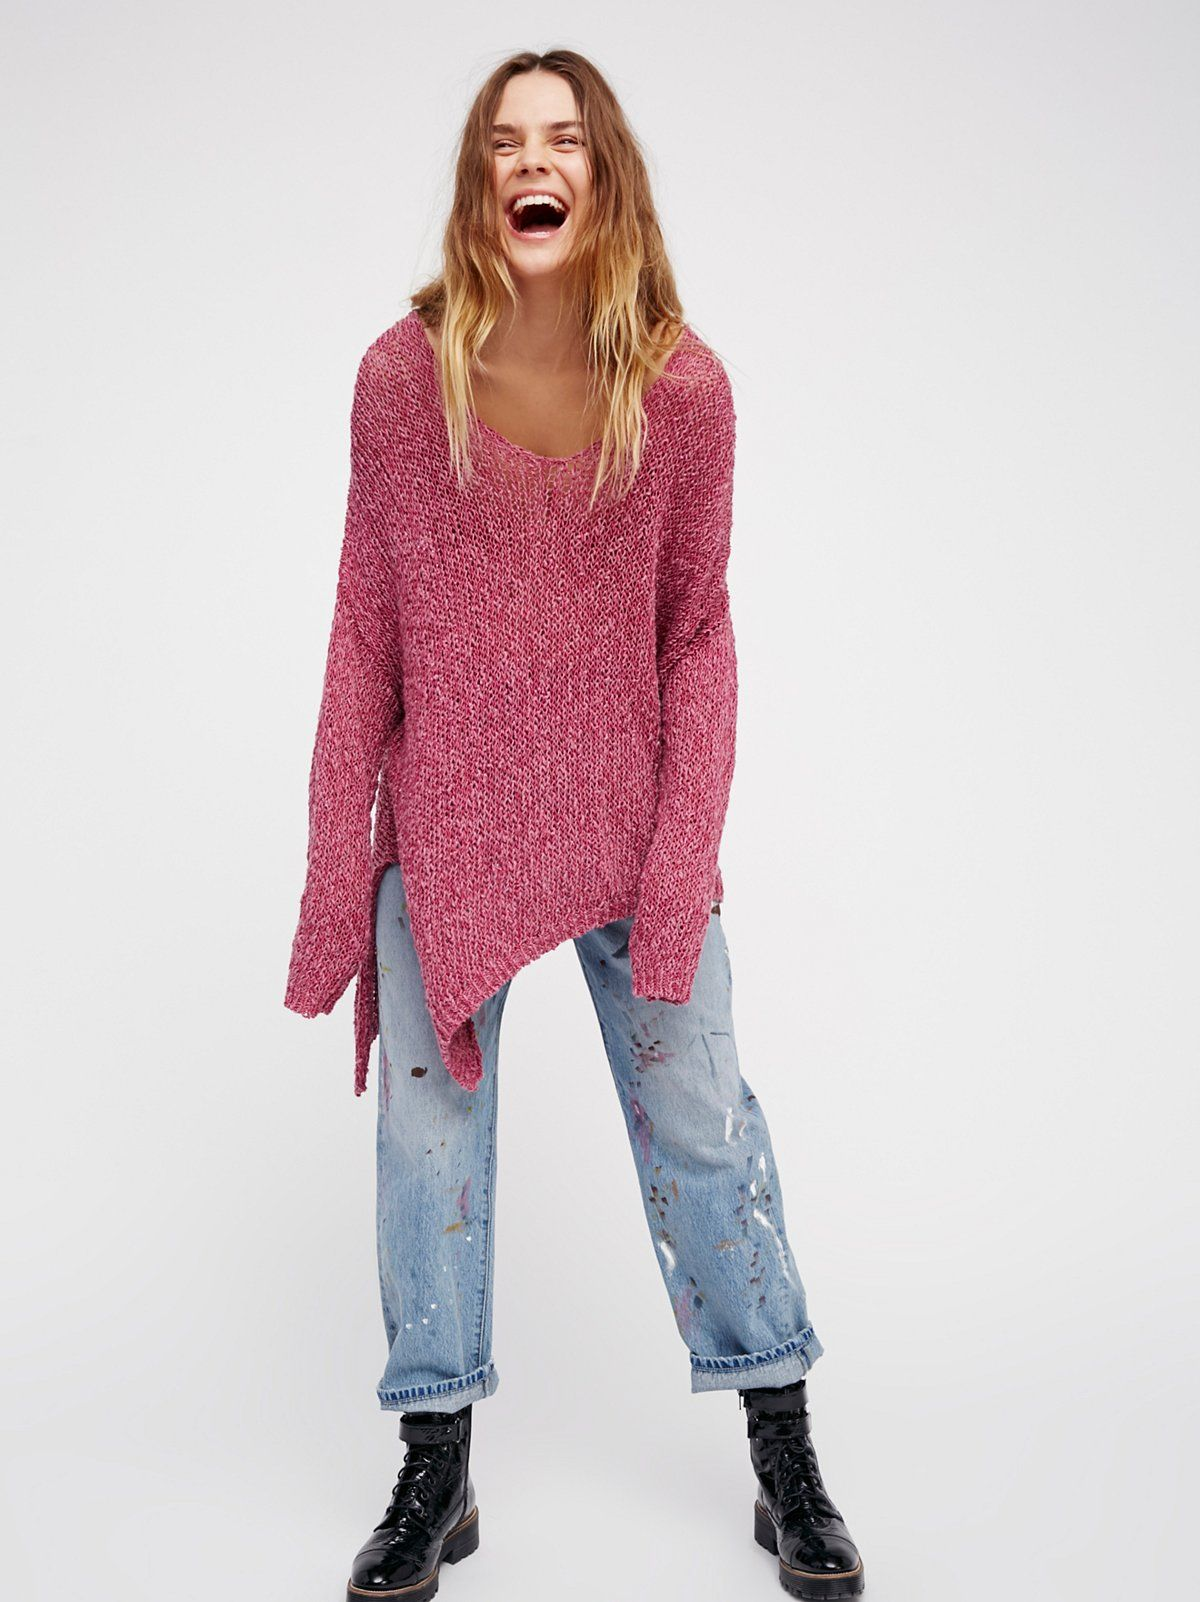 cc10ae1f8bb1 Women Sweater #Knitting, #Knitwear, #Sweater #sweater #knitwear #cardigan # pullover #knitting #womensweater #ladiesknitwear China Women / Ladies /  Sweater ...